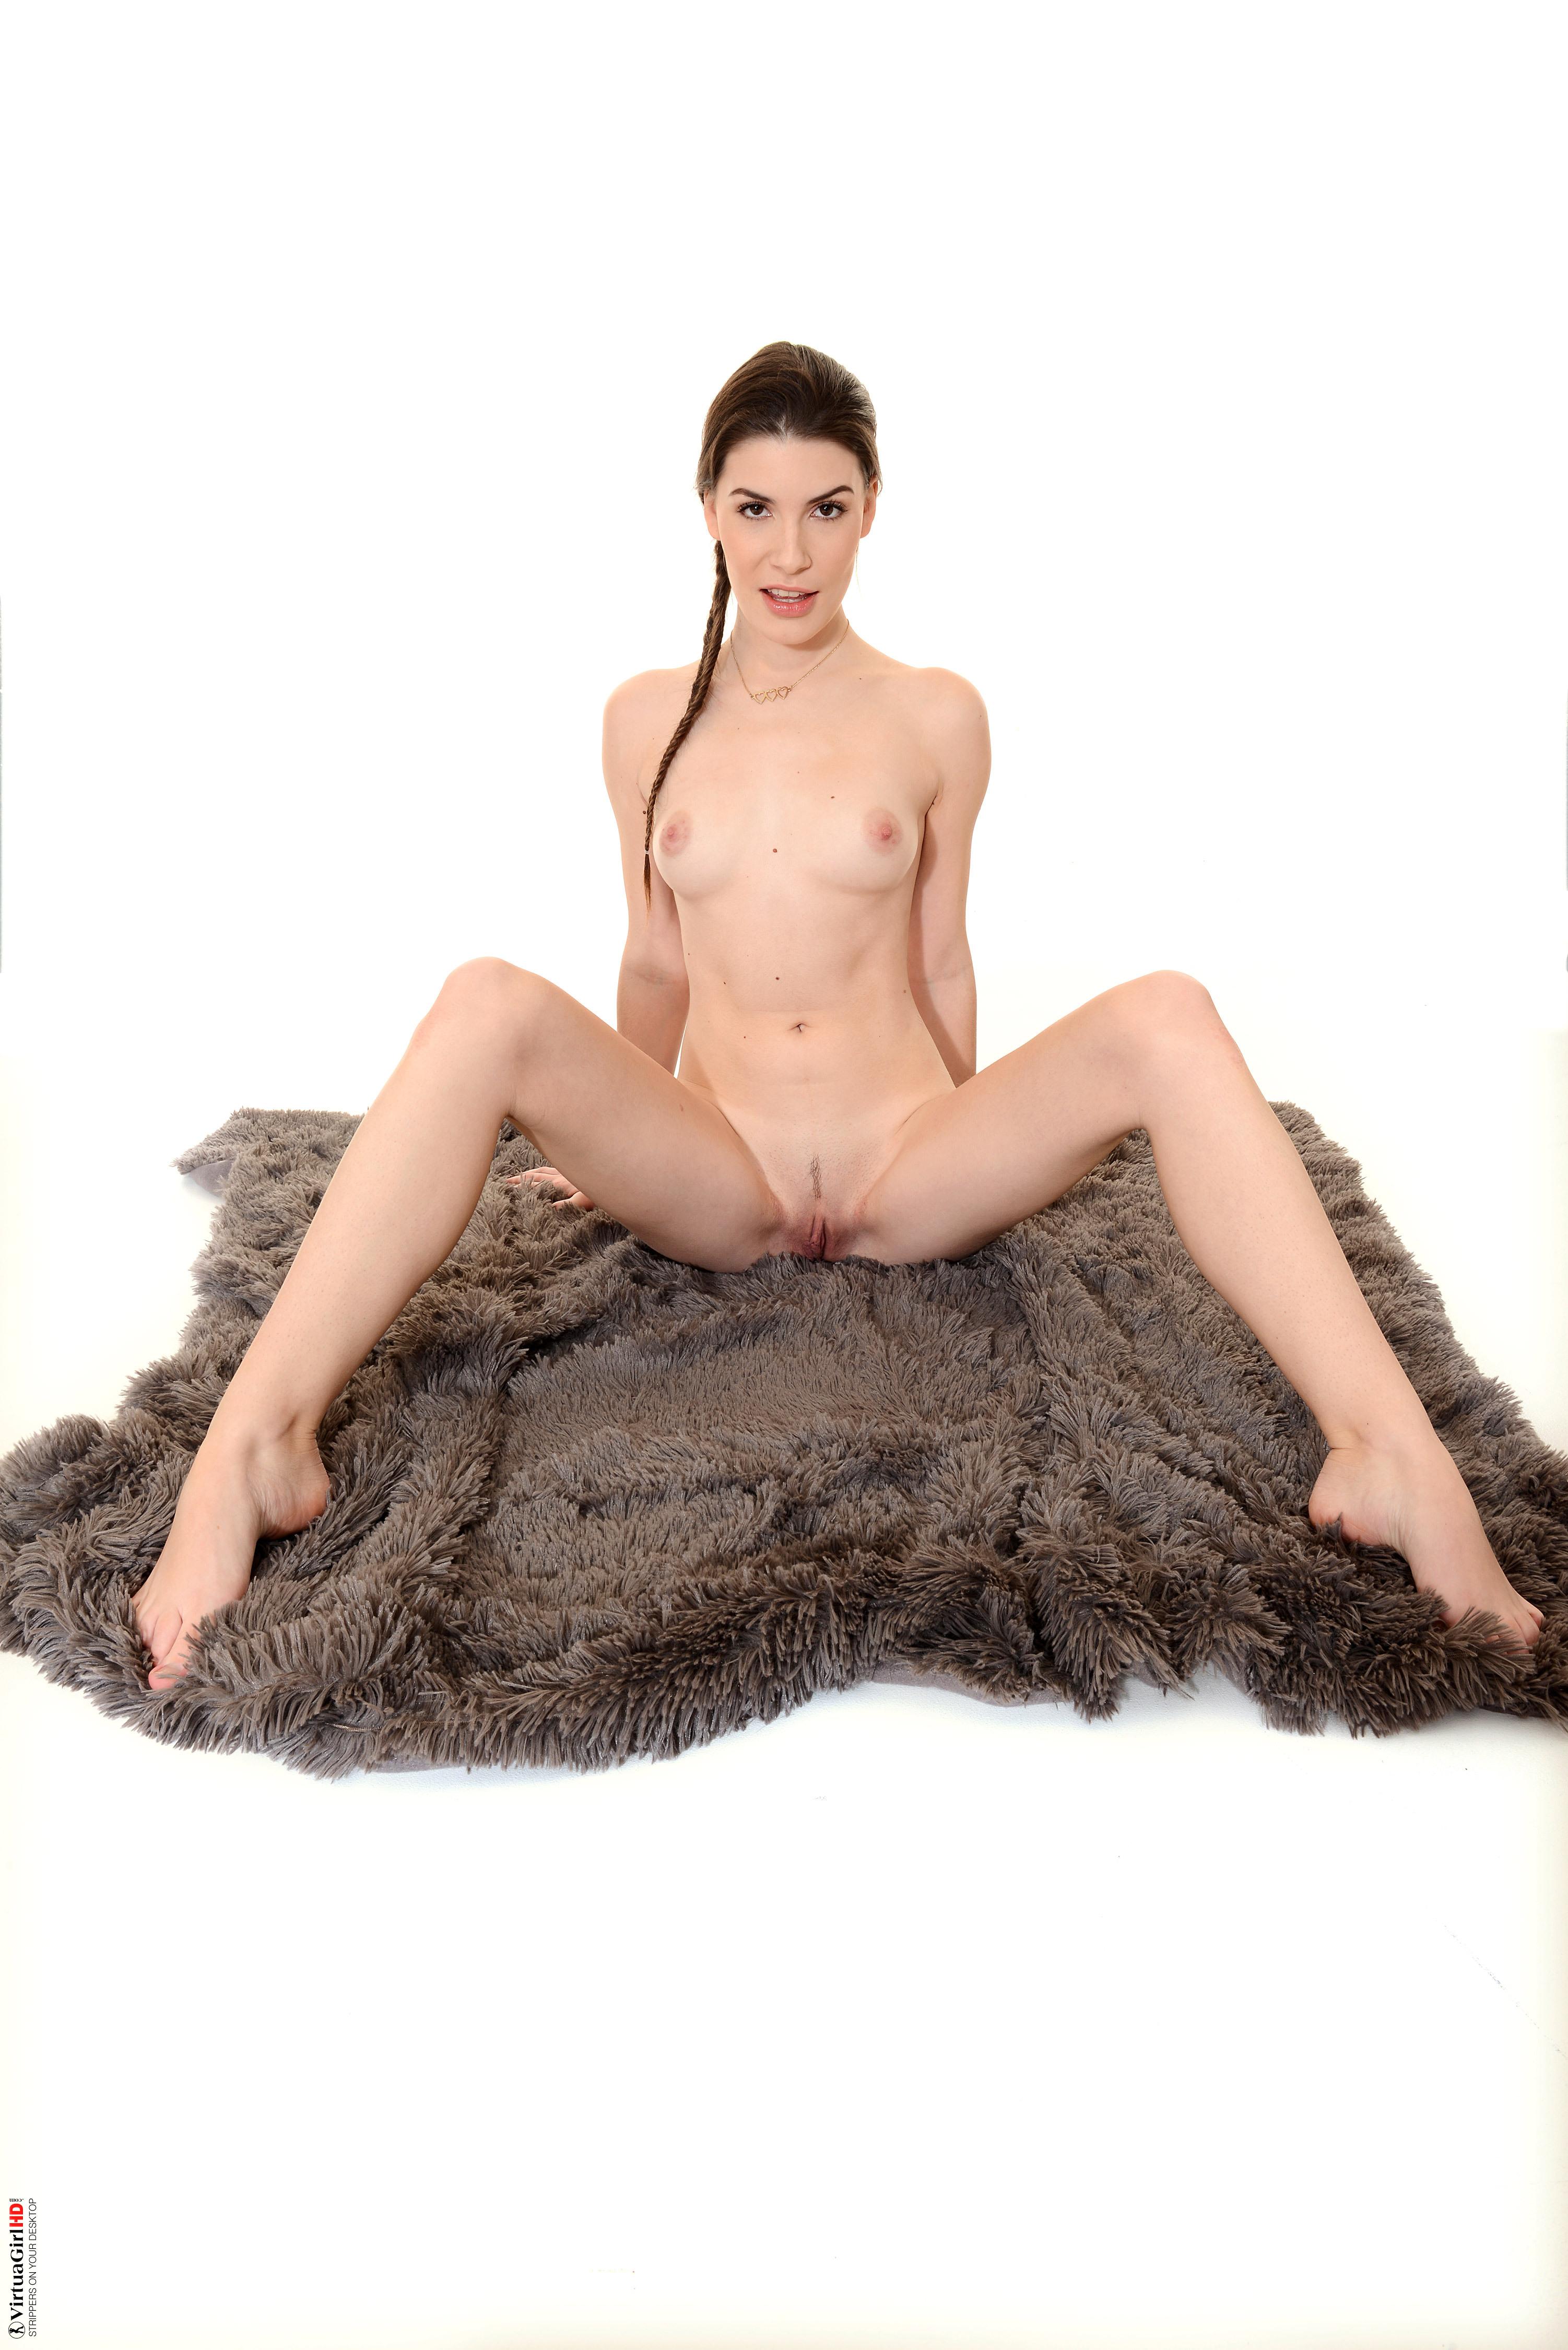 sexy porn wallpaper download